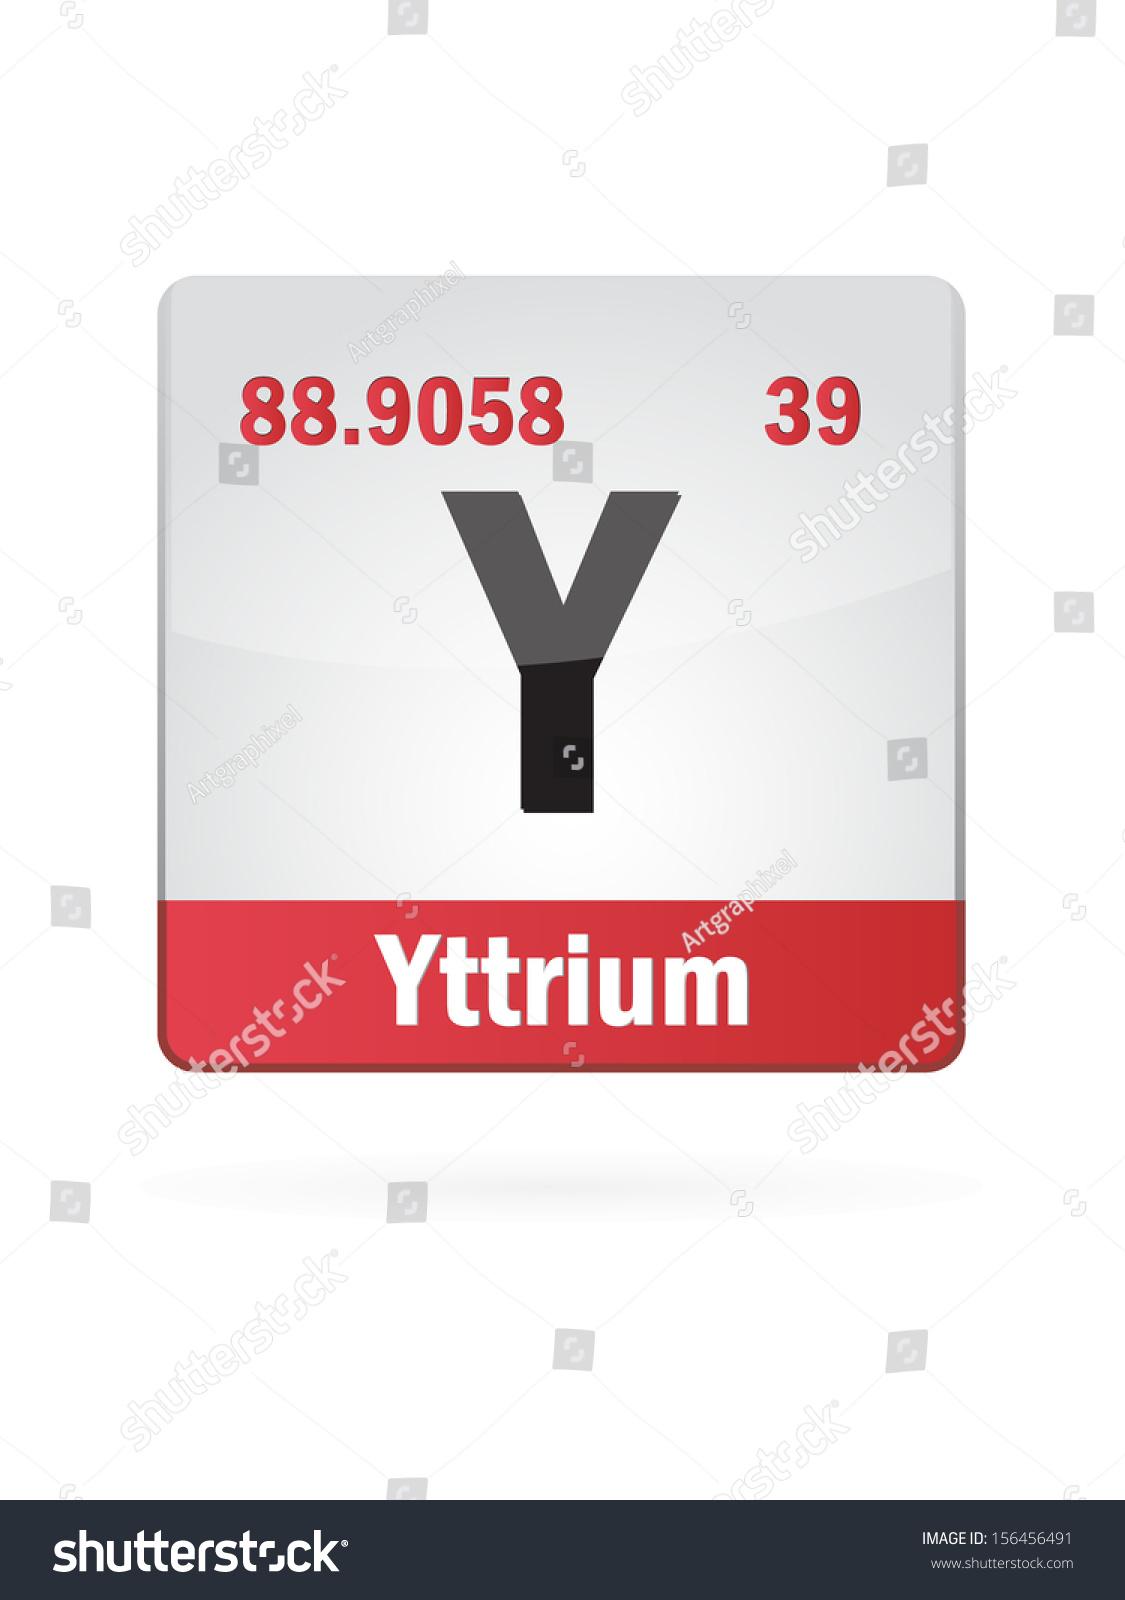 Periodic table element yttrium icon fm transmitter schematic diagram periodic table yttrium images periodic table images stock vector yttrium symbol illustration icon on white background gamestrikefo Gallery